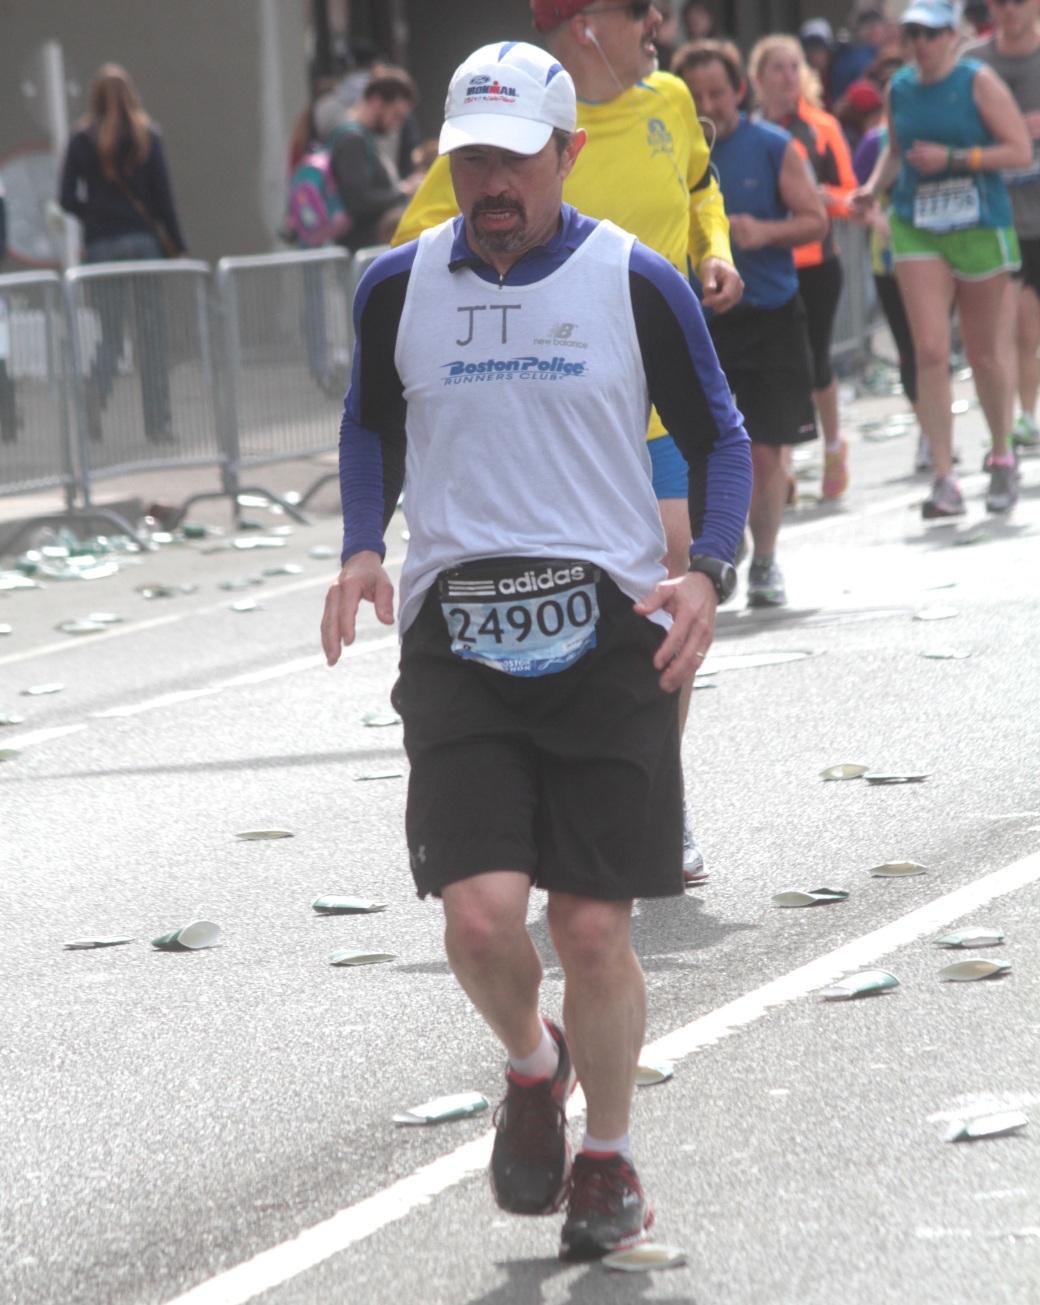 boston marathon 2013 number 24900